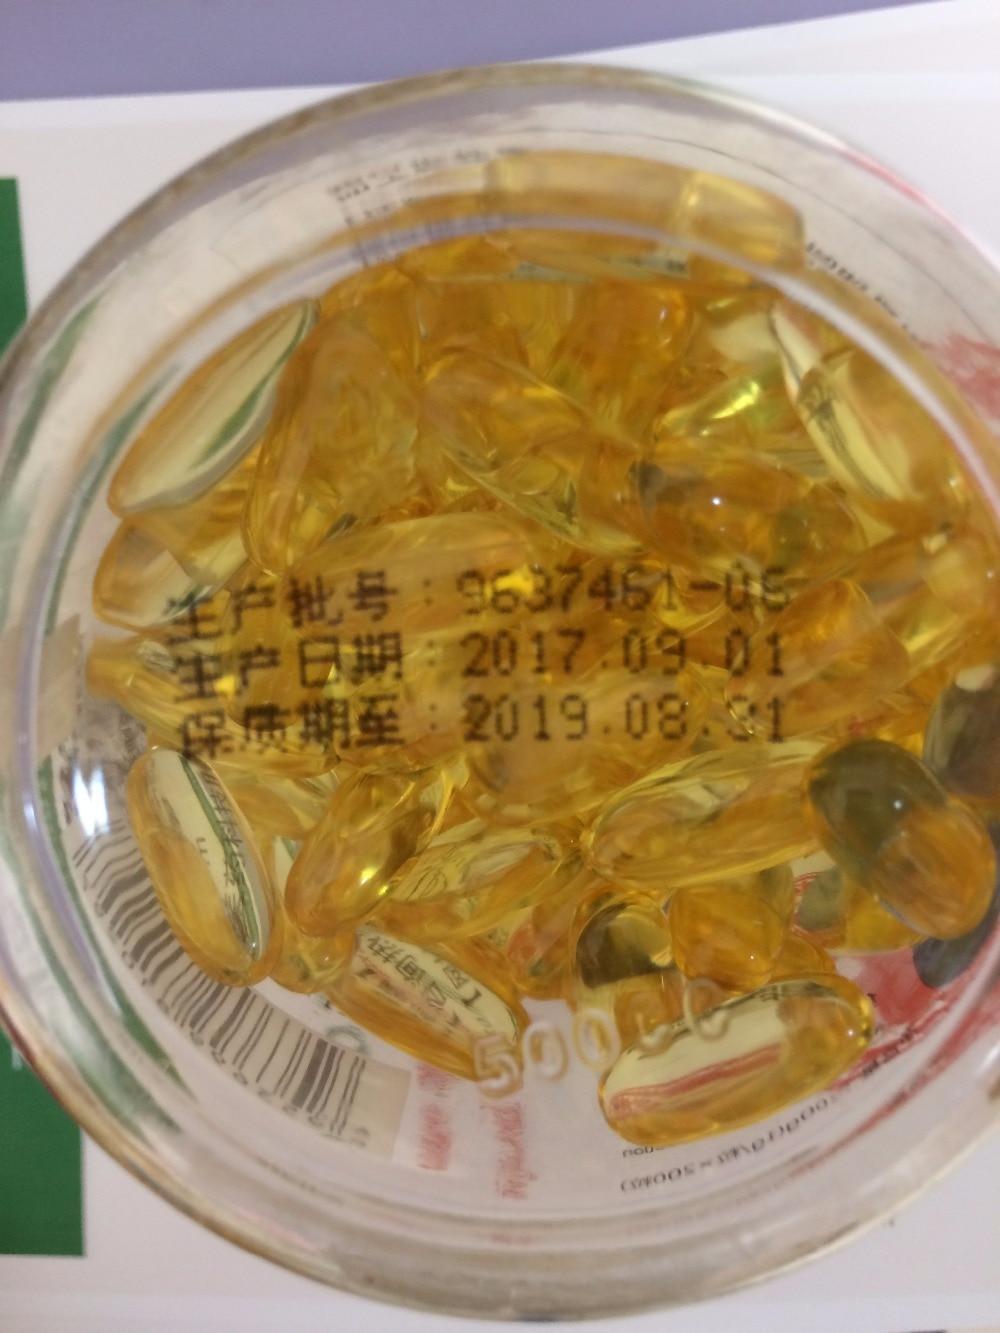 NEW Package 1000mg*200 Bottle Deep Sea Fish O-OILOmega (3) DHA & EPA Supplement Sports Nutrition цена